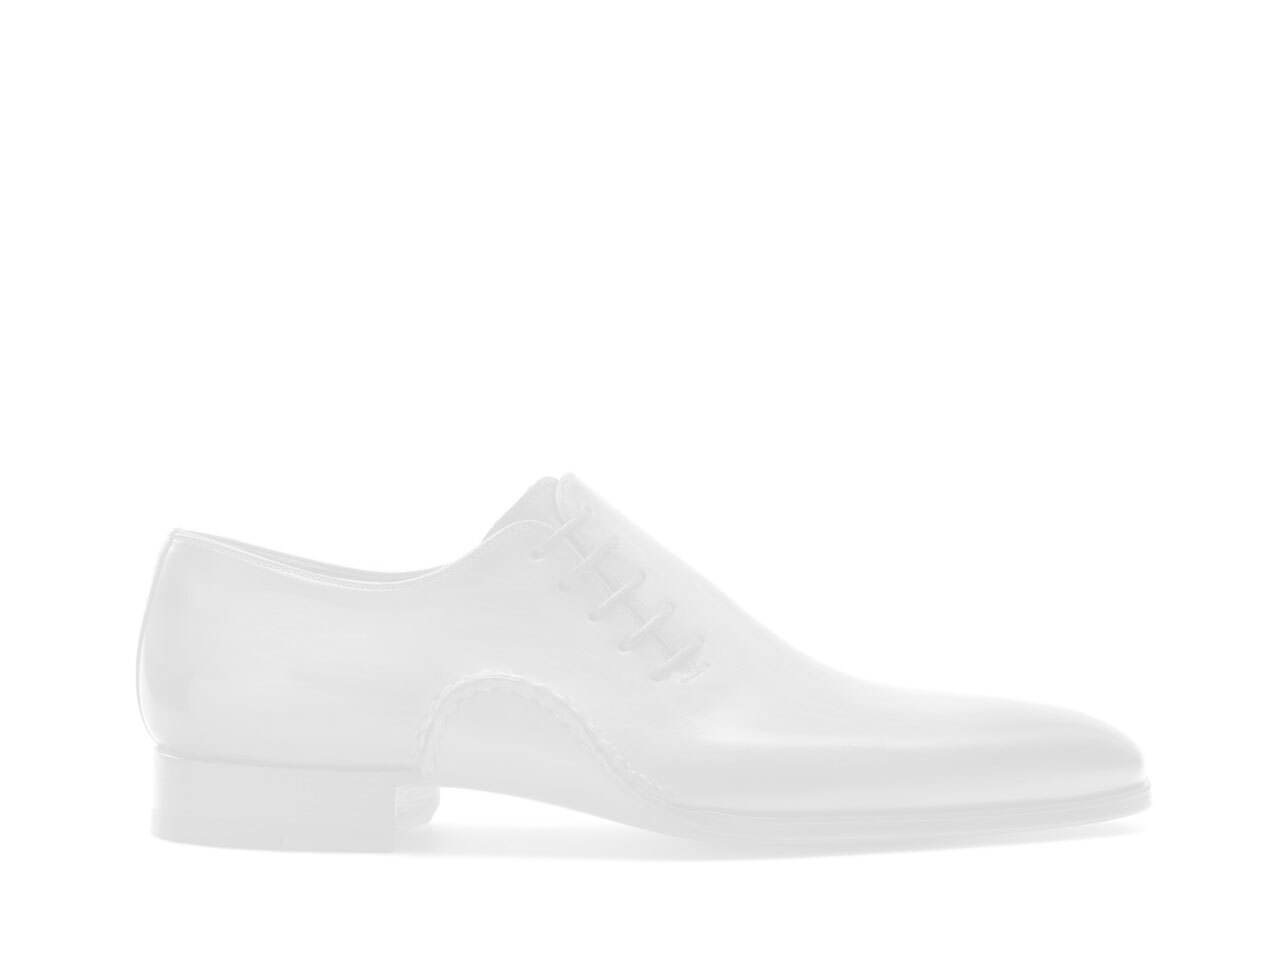 Side view of the Magnanni Garrett Cuero Men's Double Monk Strap Shoes